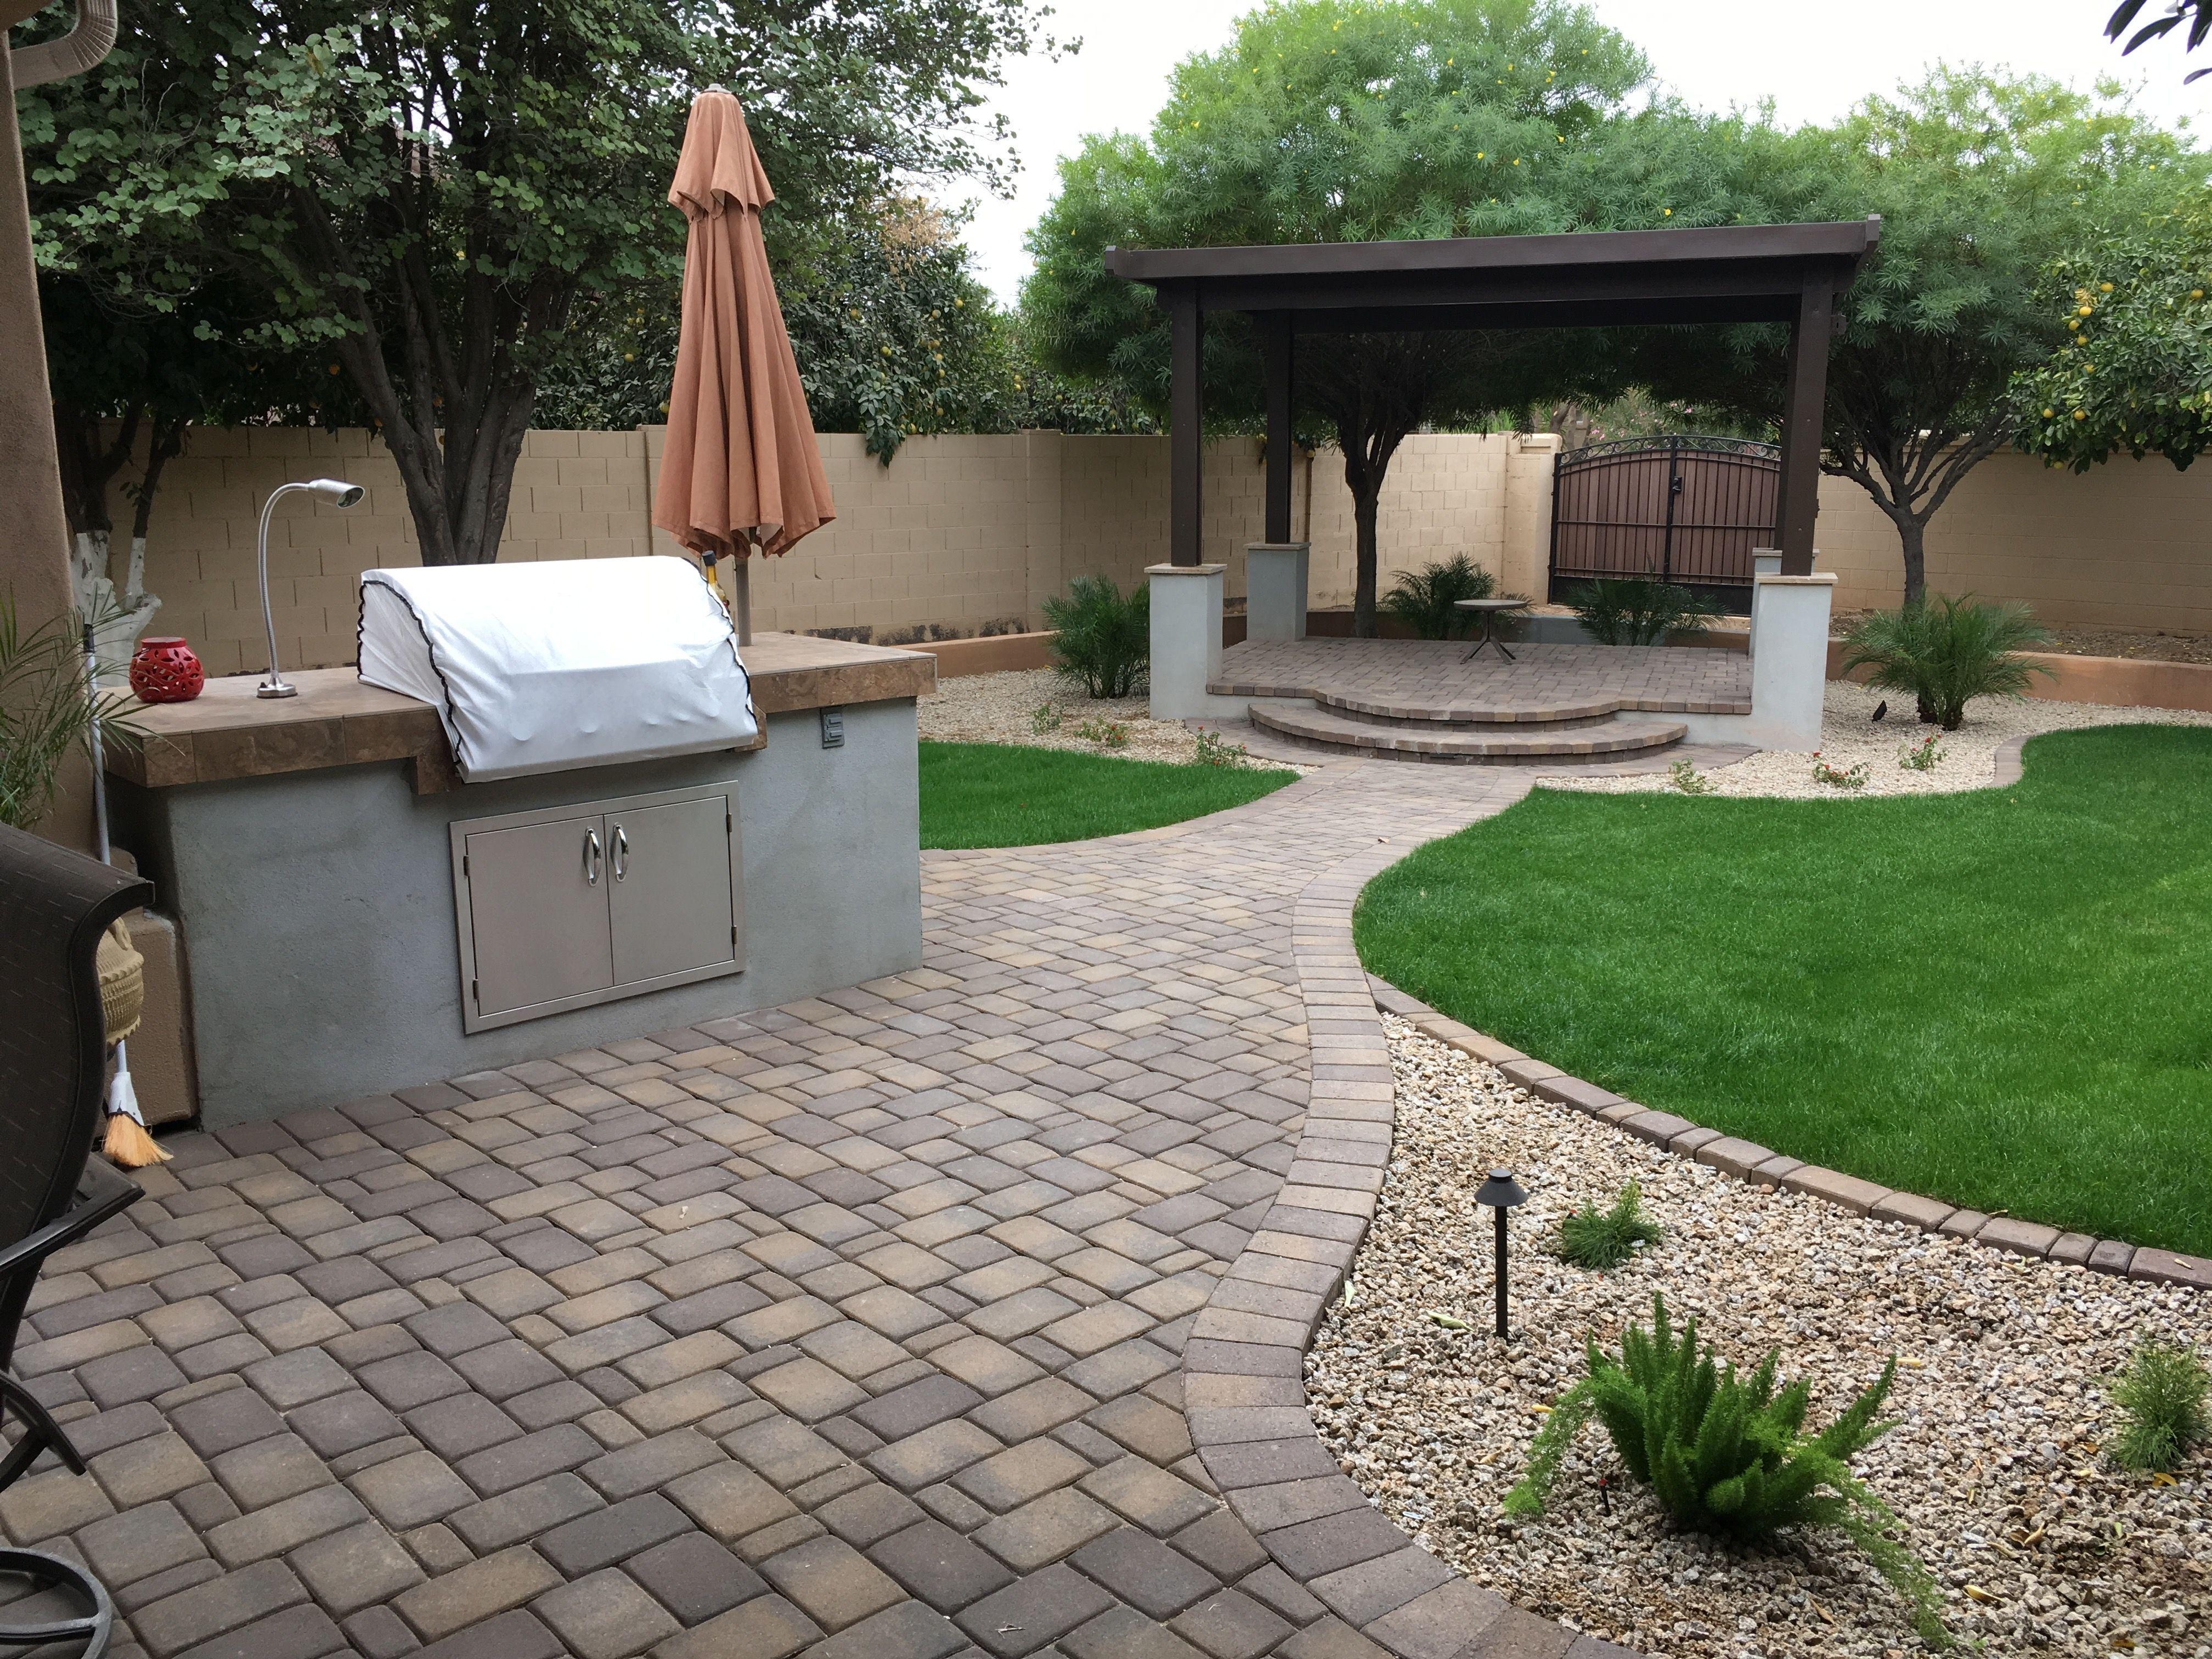 Arizona Backyard Design With Simple Backyard Pation Ideas Patio